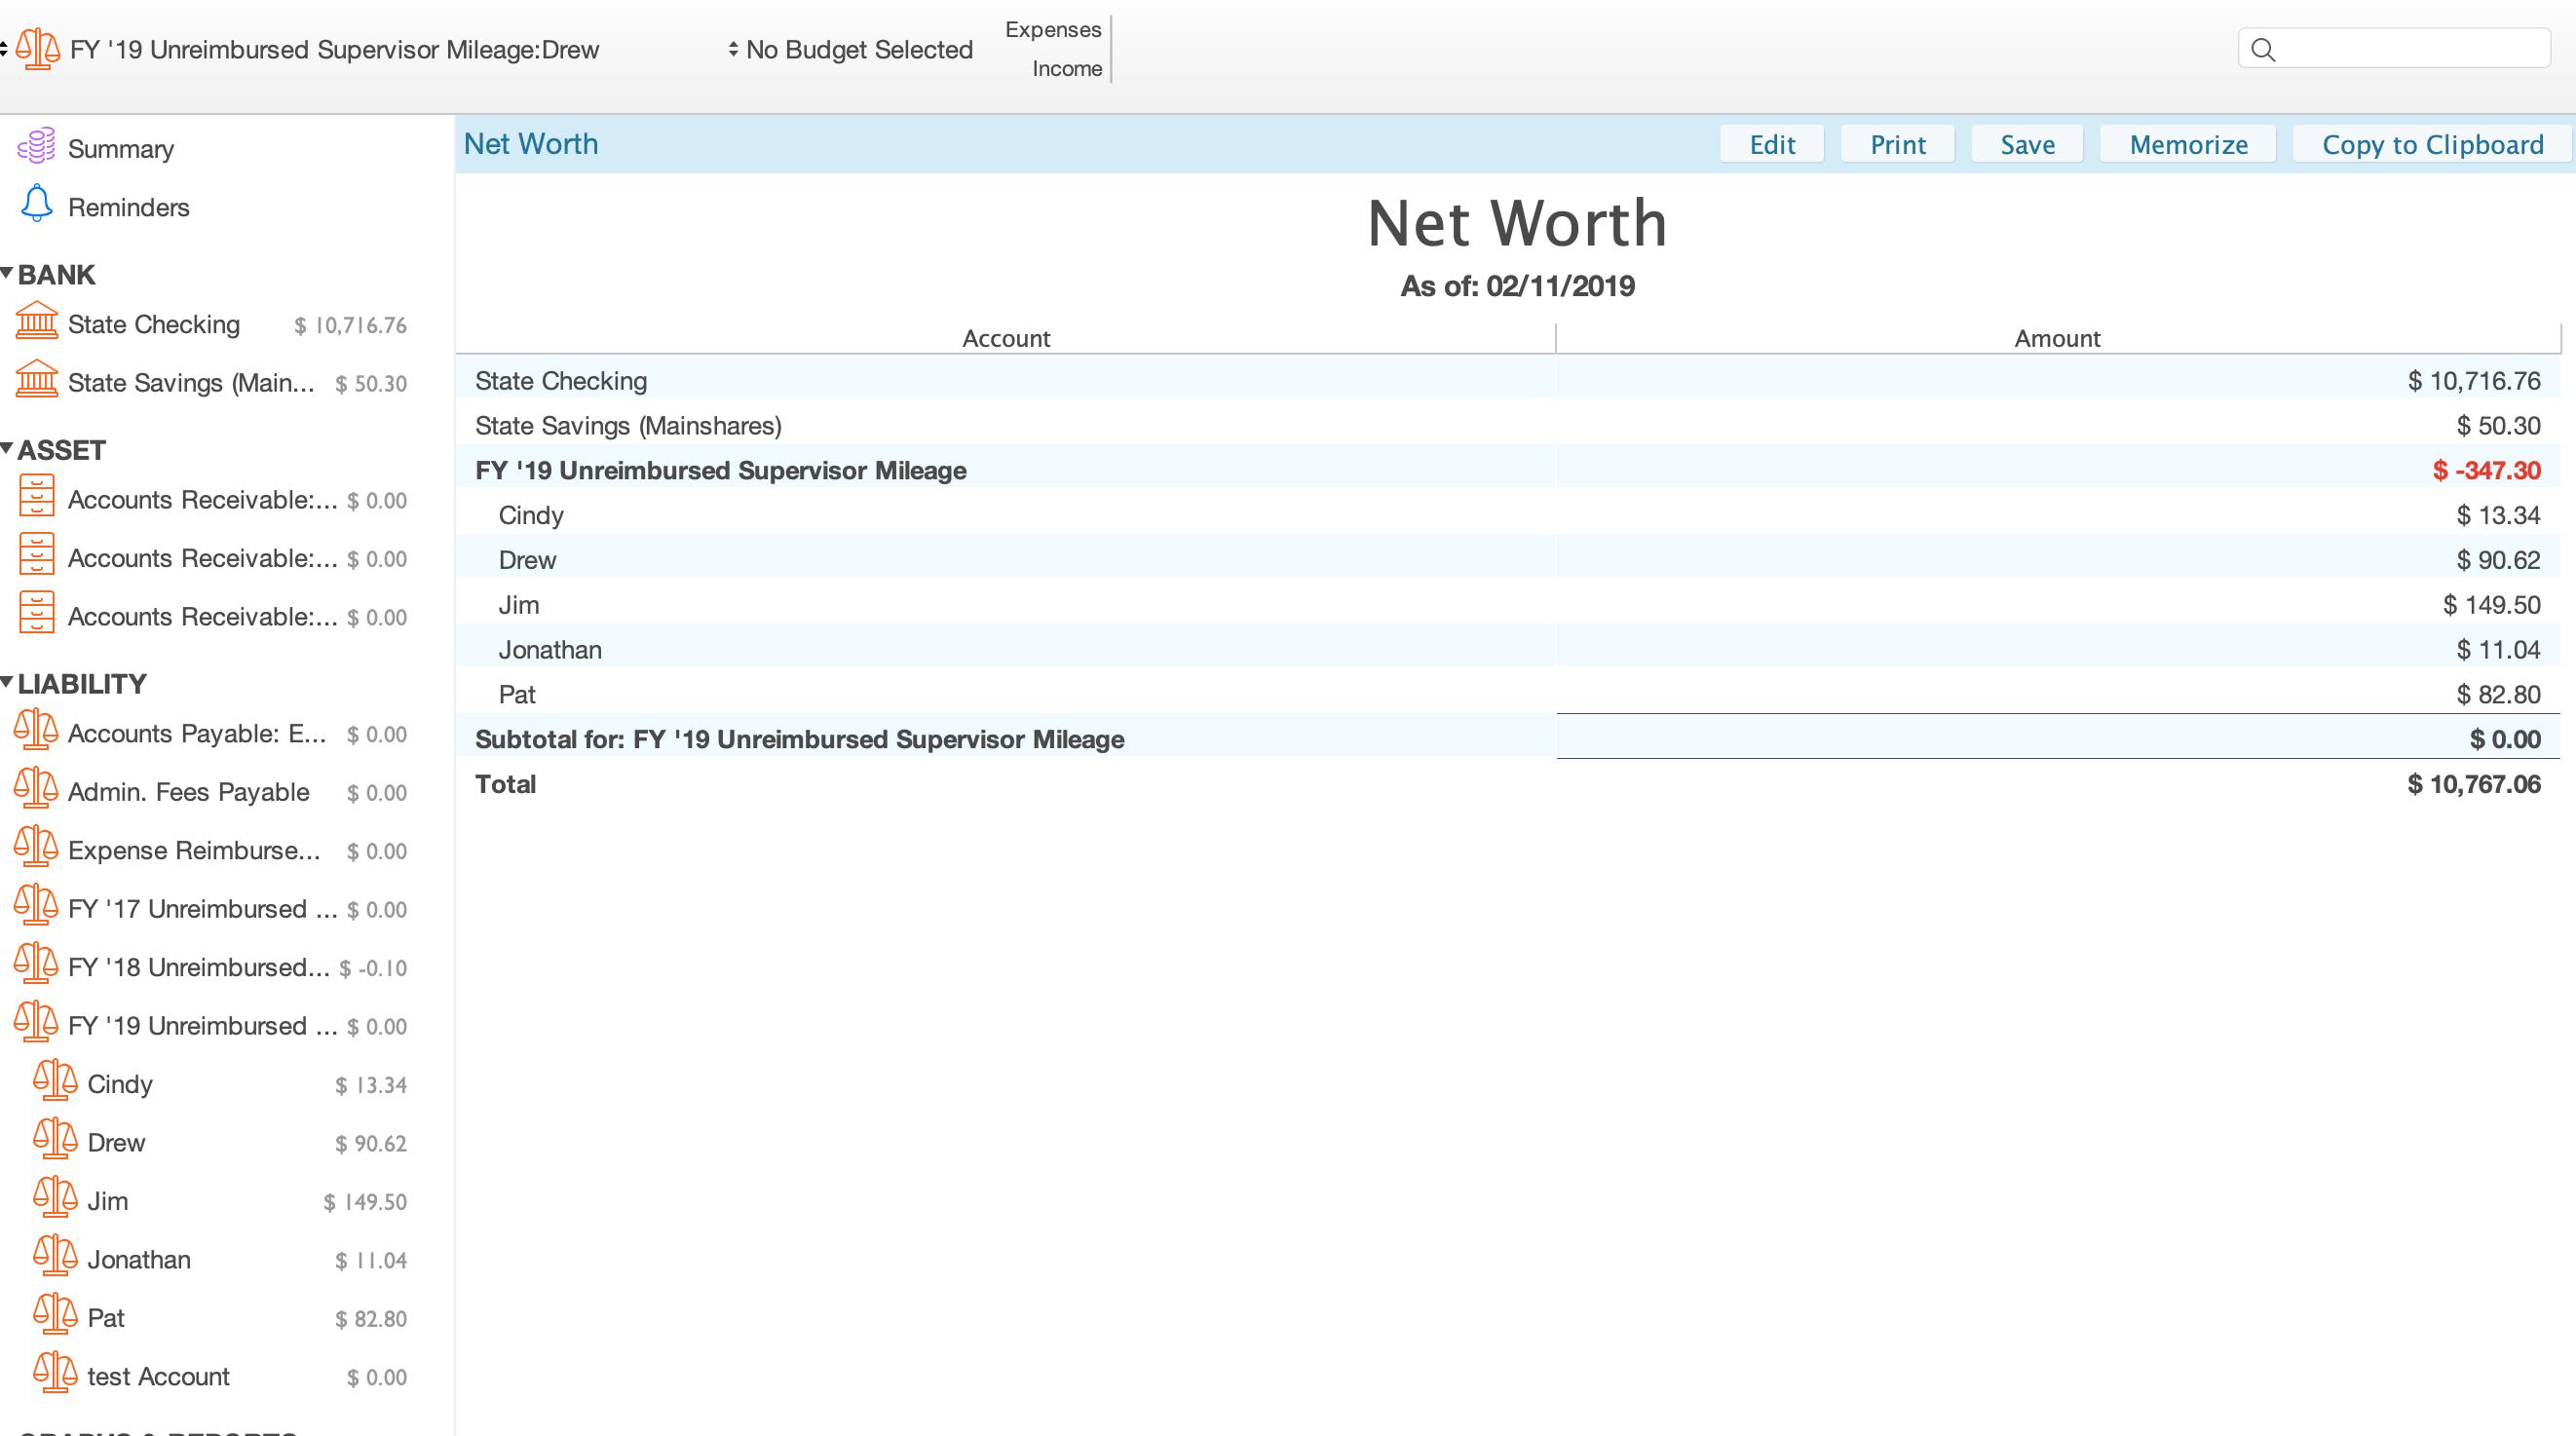 Networth_example